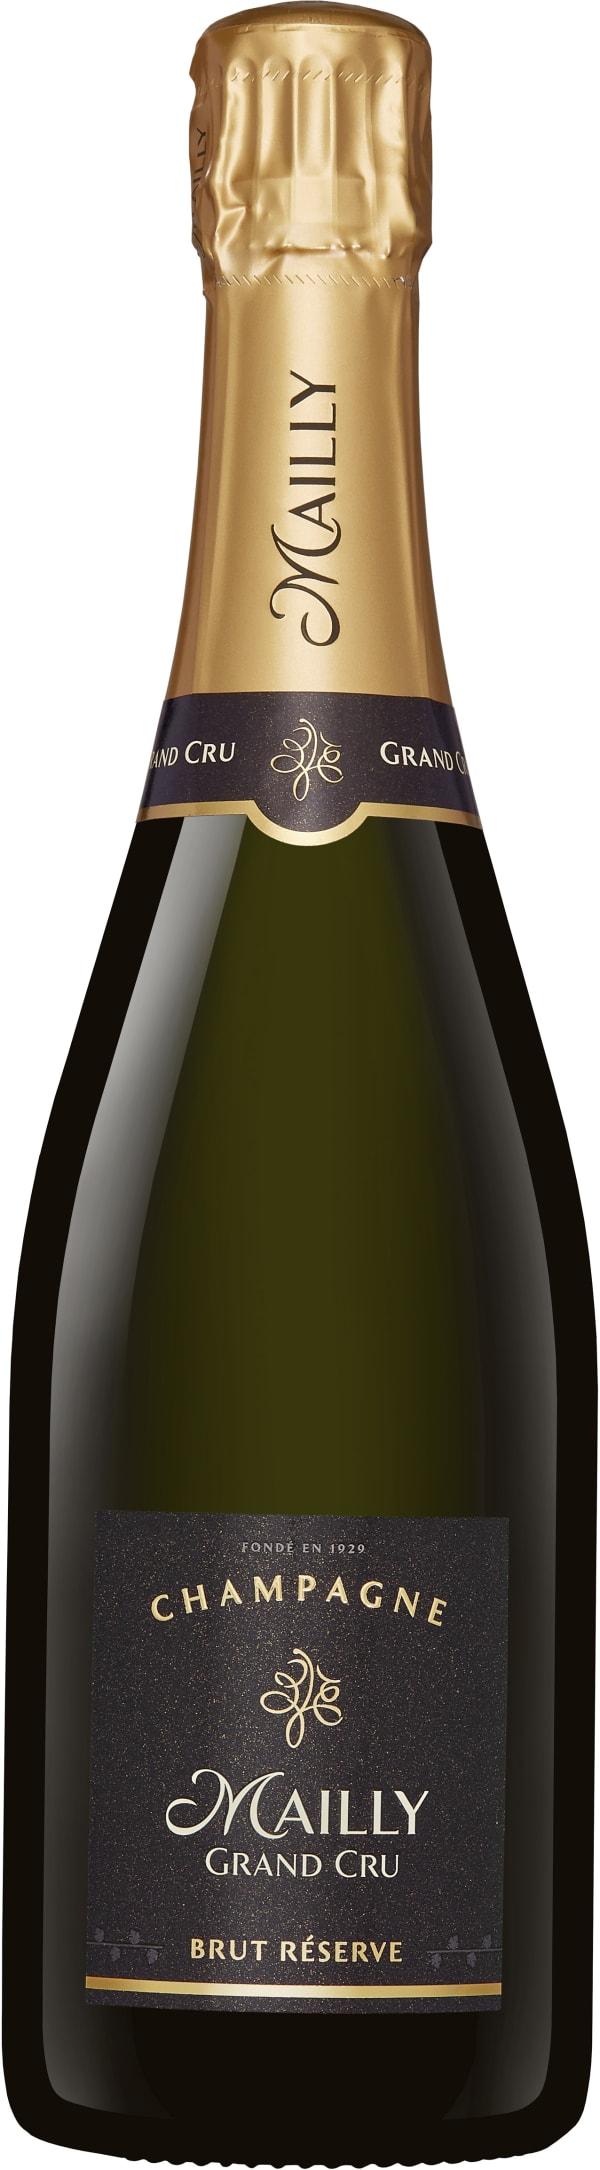 Mailly Grand Cru Réserve Champagne Brut